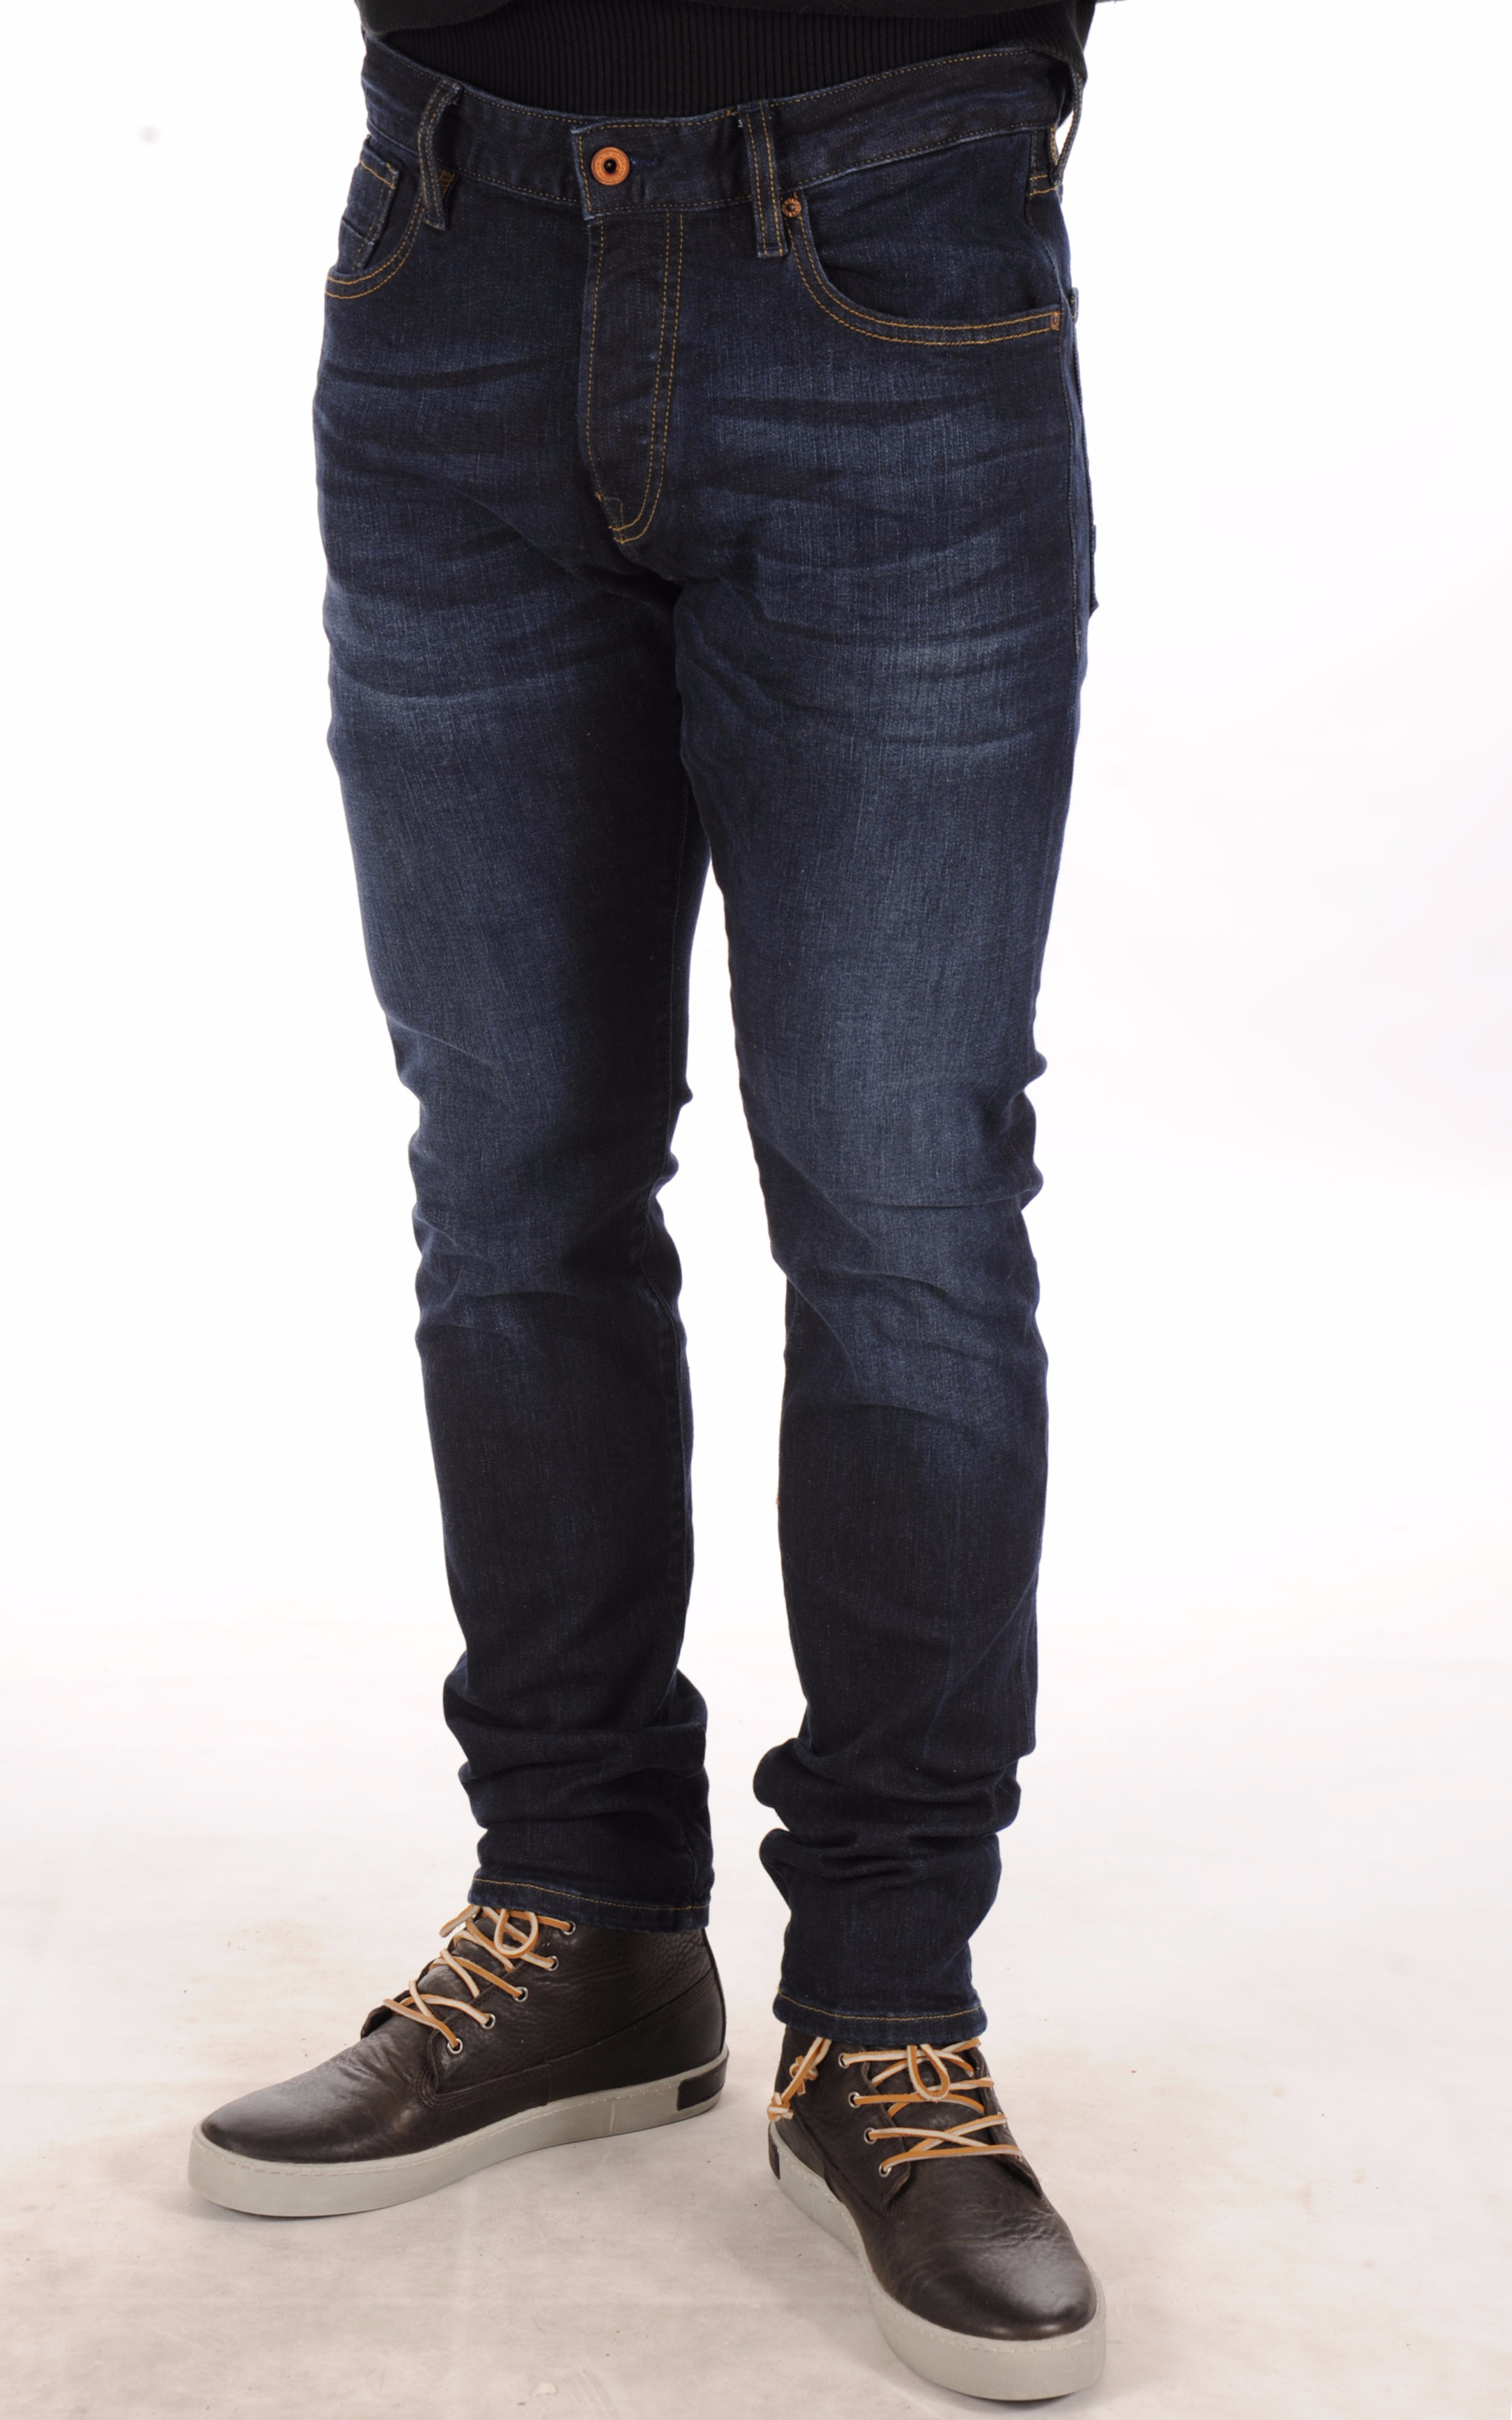 Jeans Brut Homme Scotch & Soda